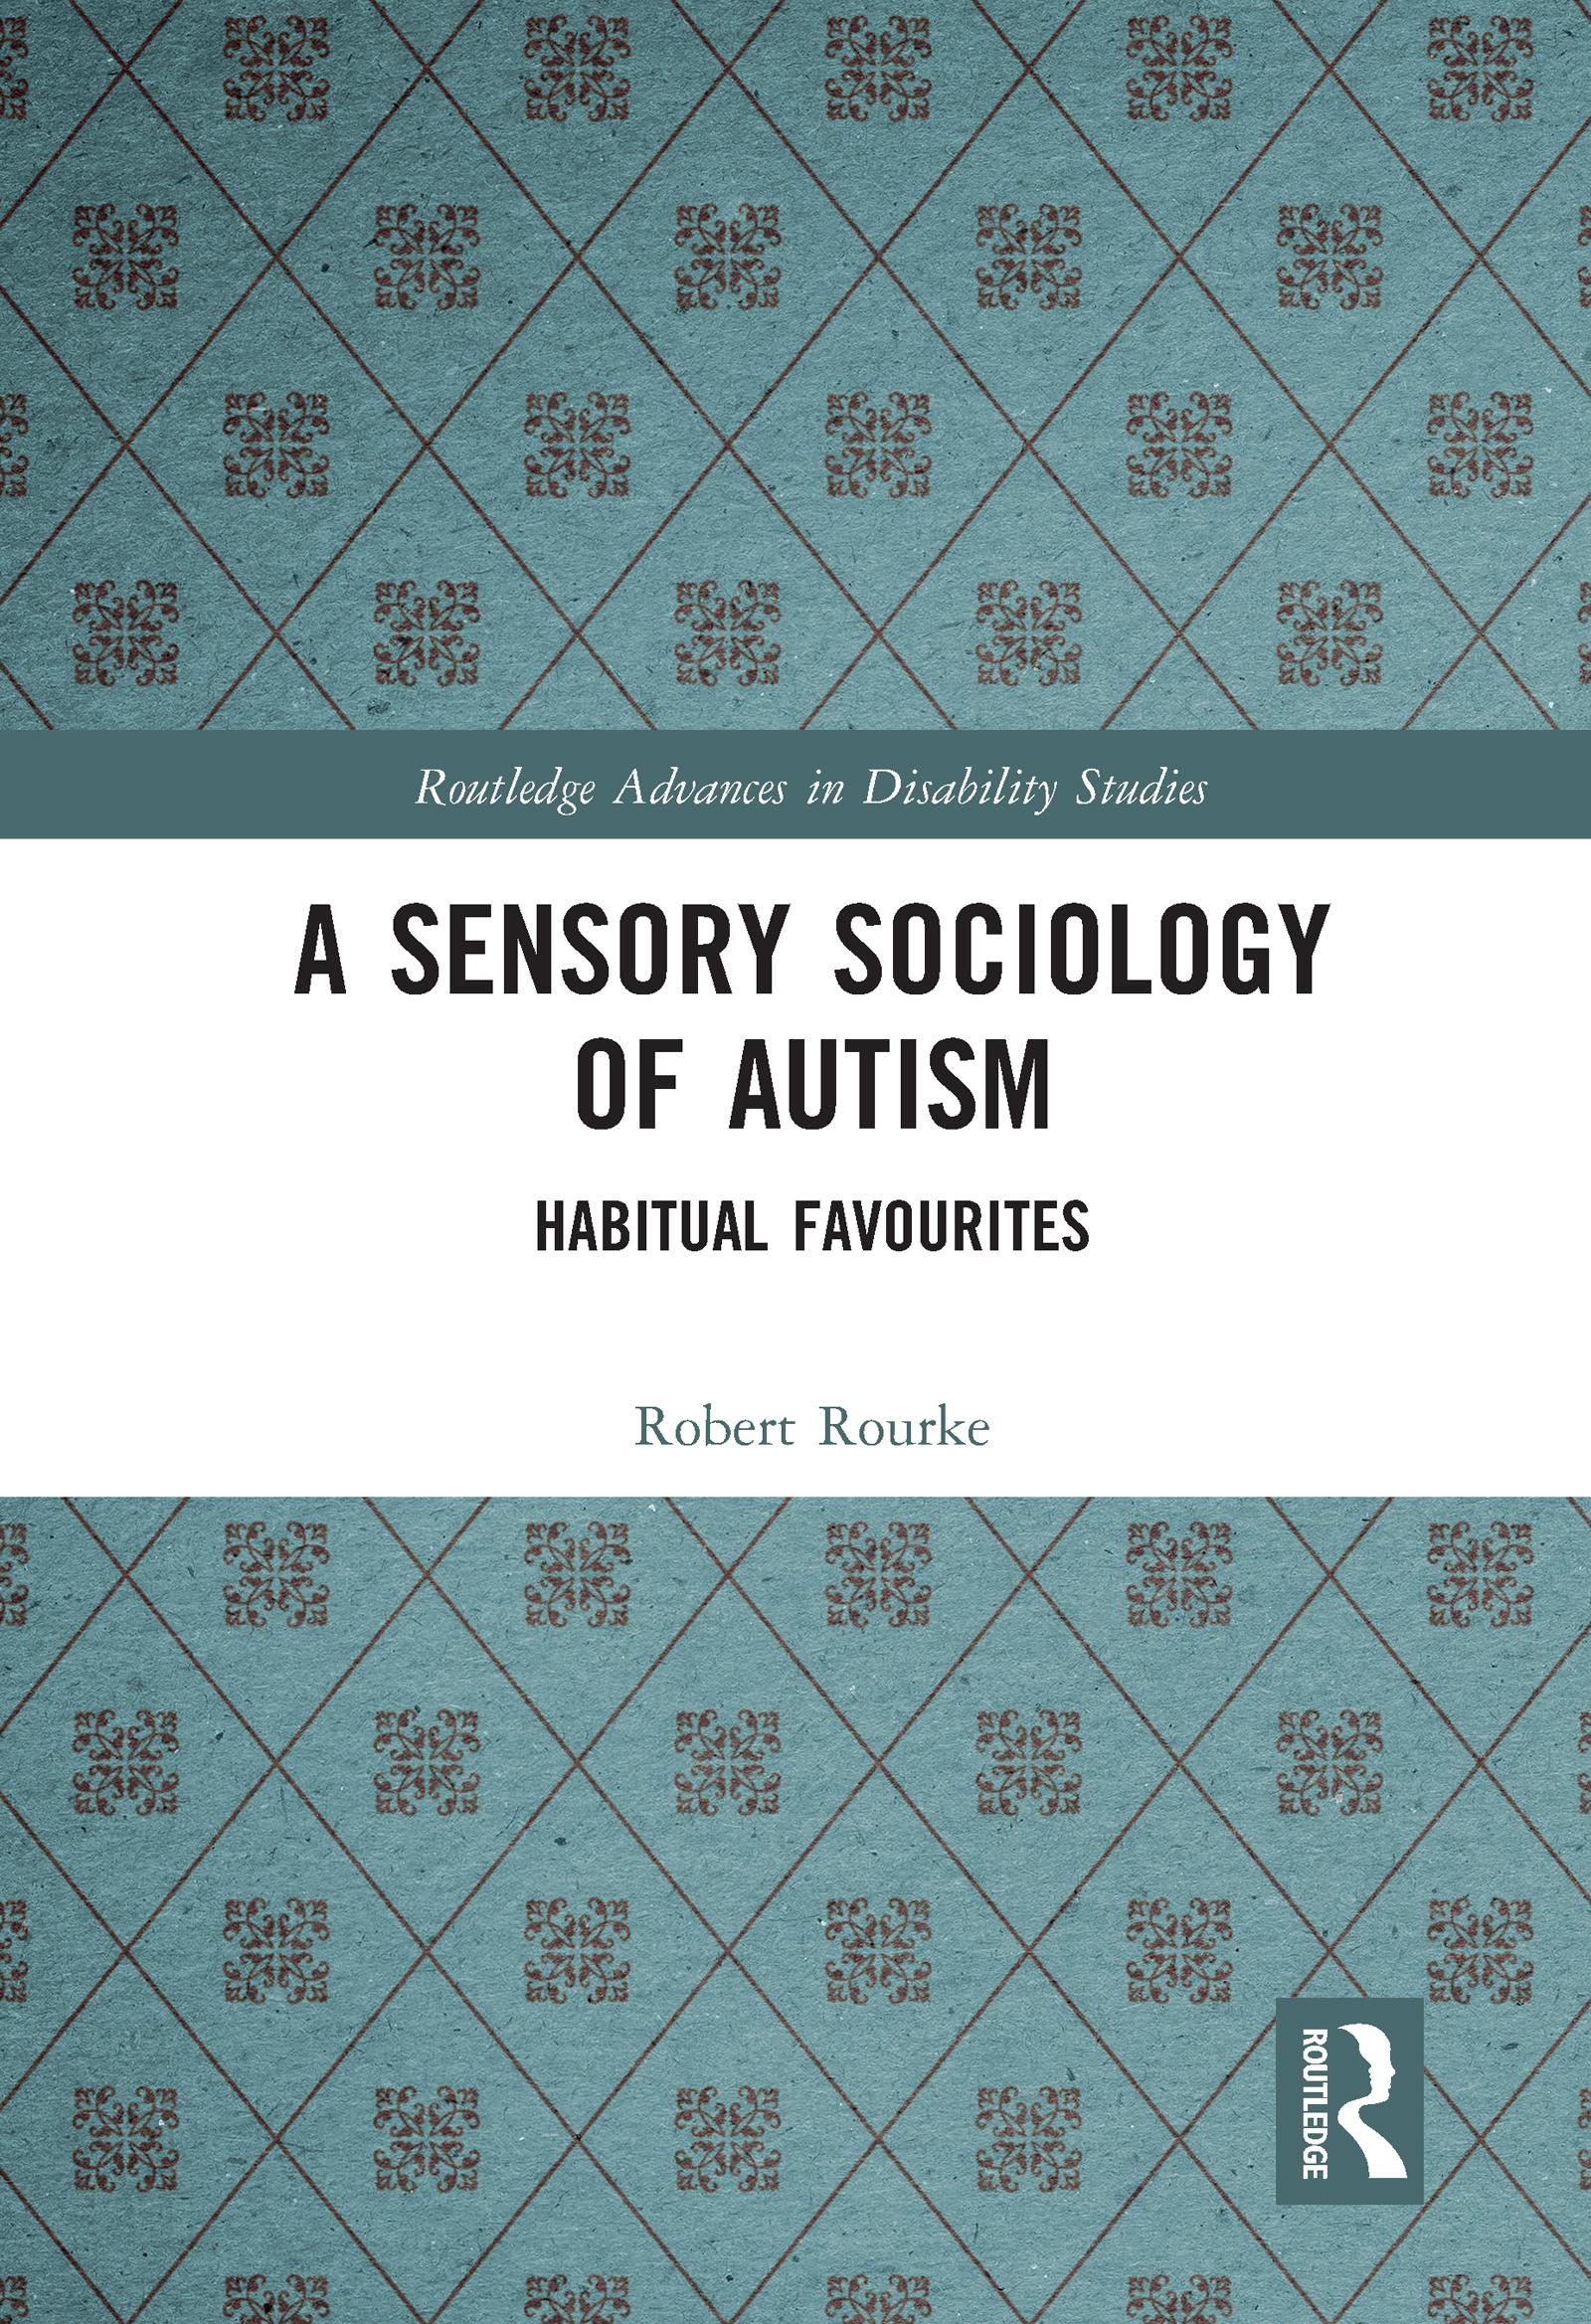 A Sensory Sociology of Autism